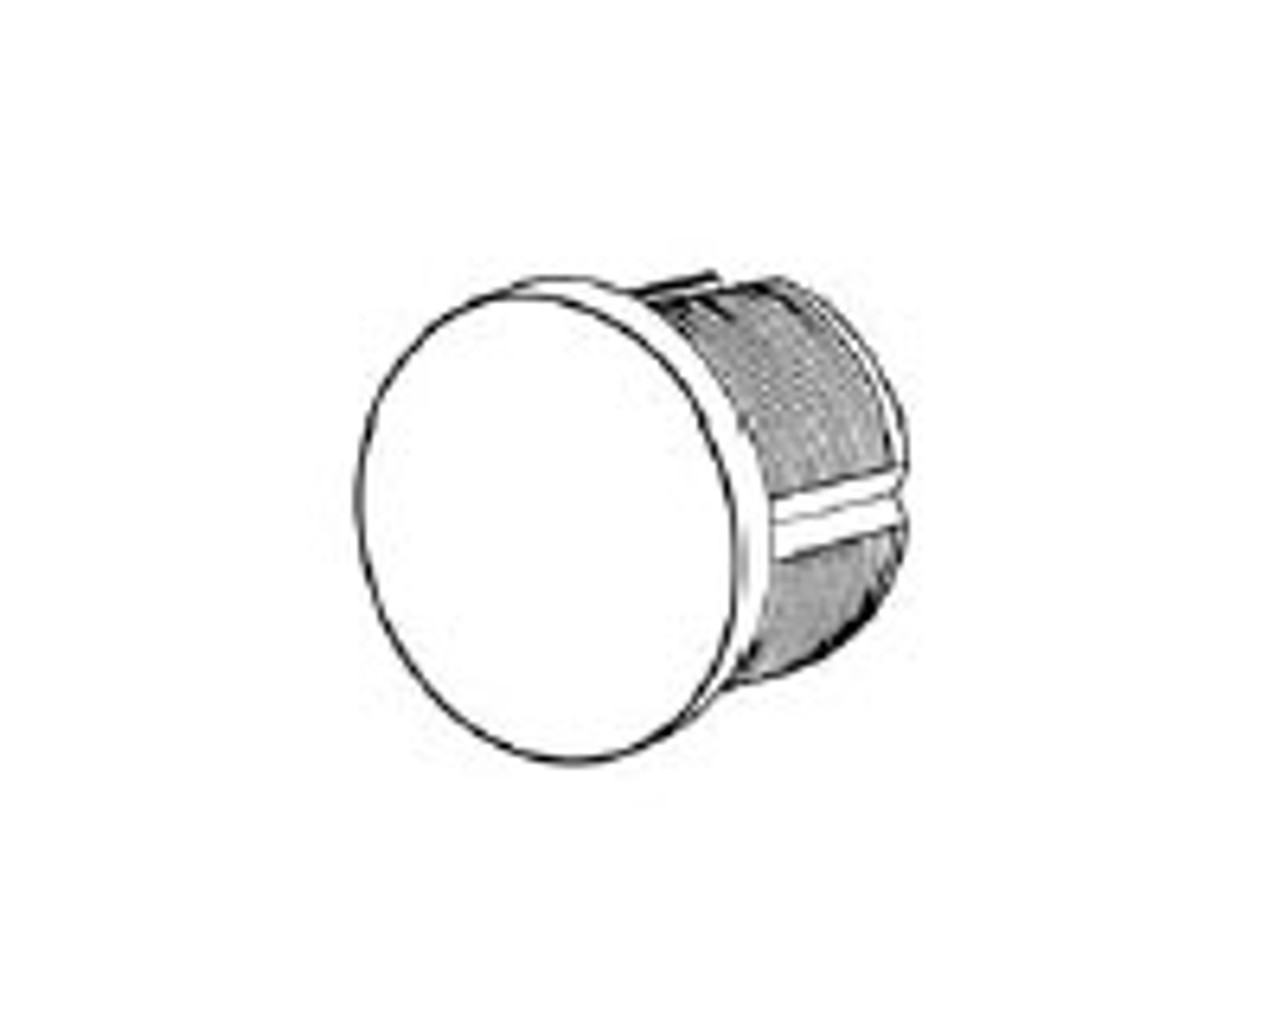 "ILCO 7200 1-1/4"" Dummy Mortise Cylinder"